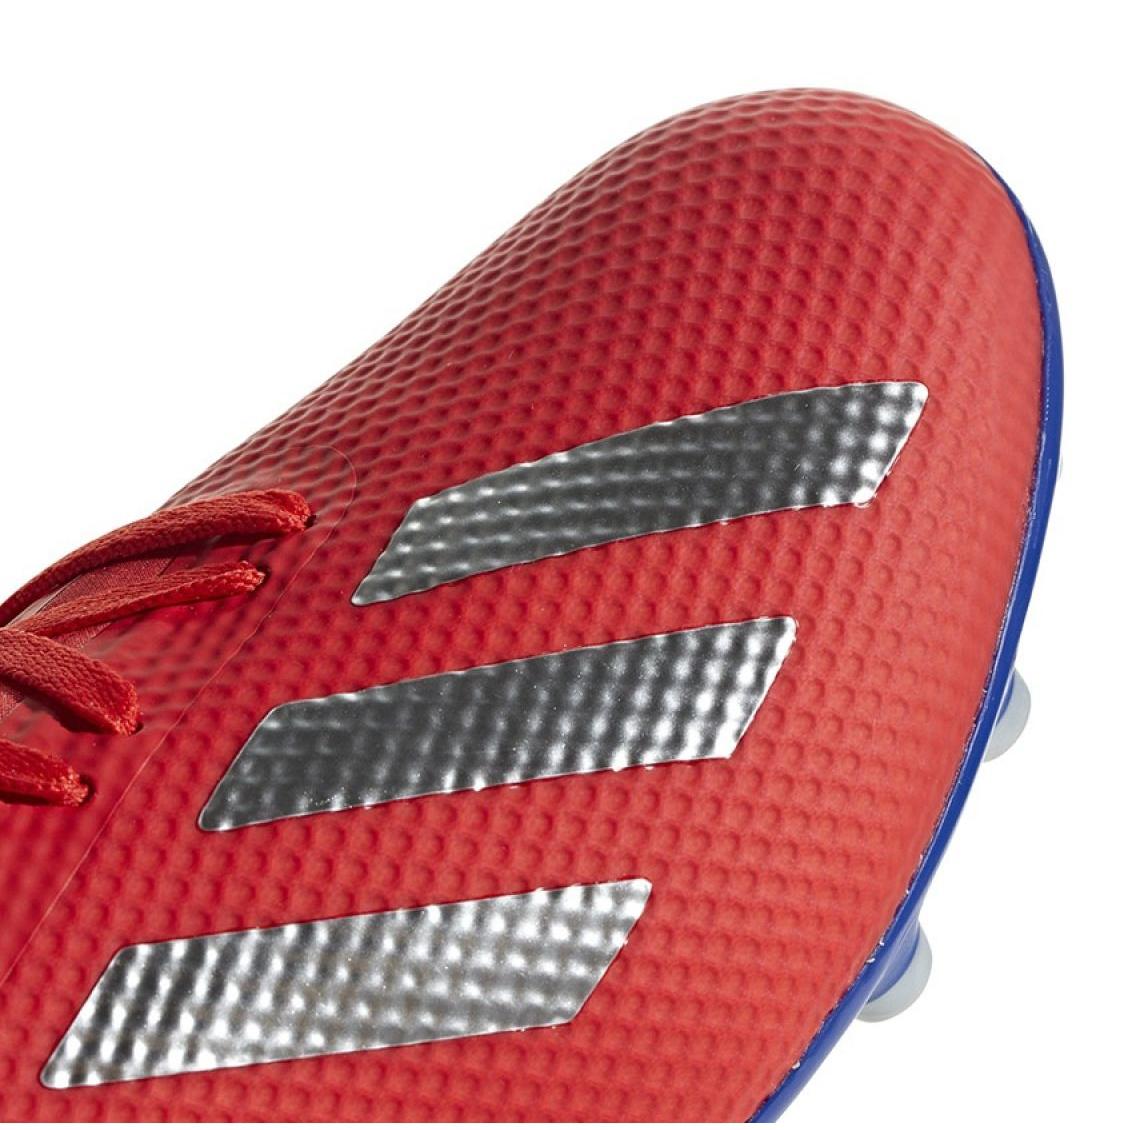 Fodboldstøvler adidas X 18.3 Ag M BC0299 ButyModne.pl